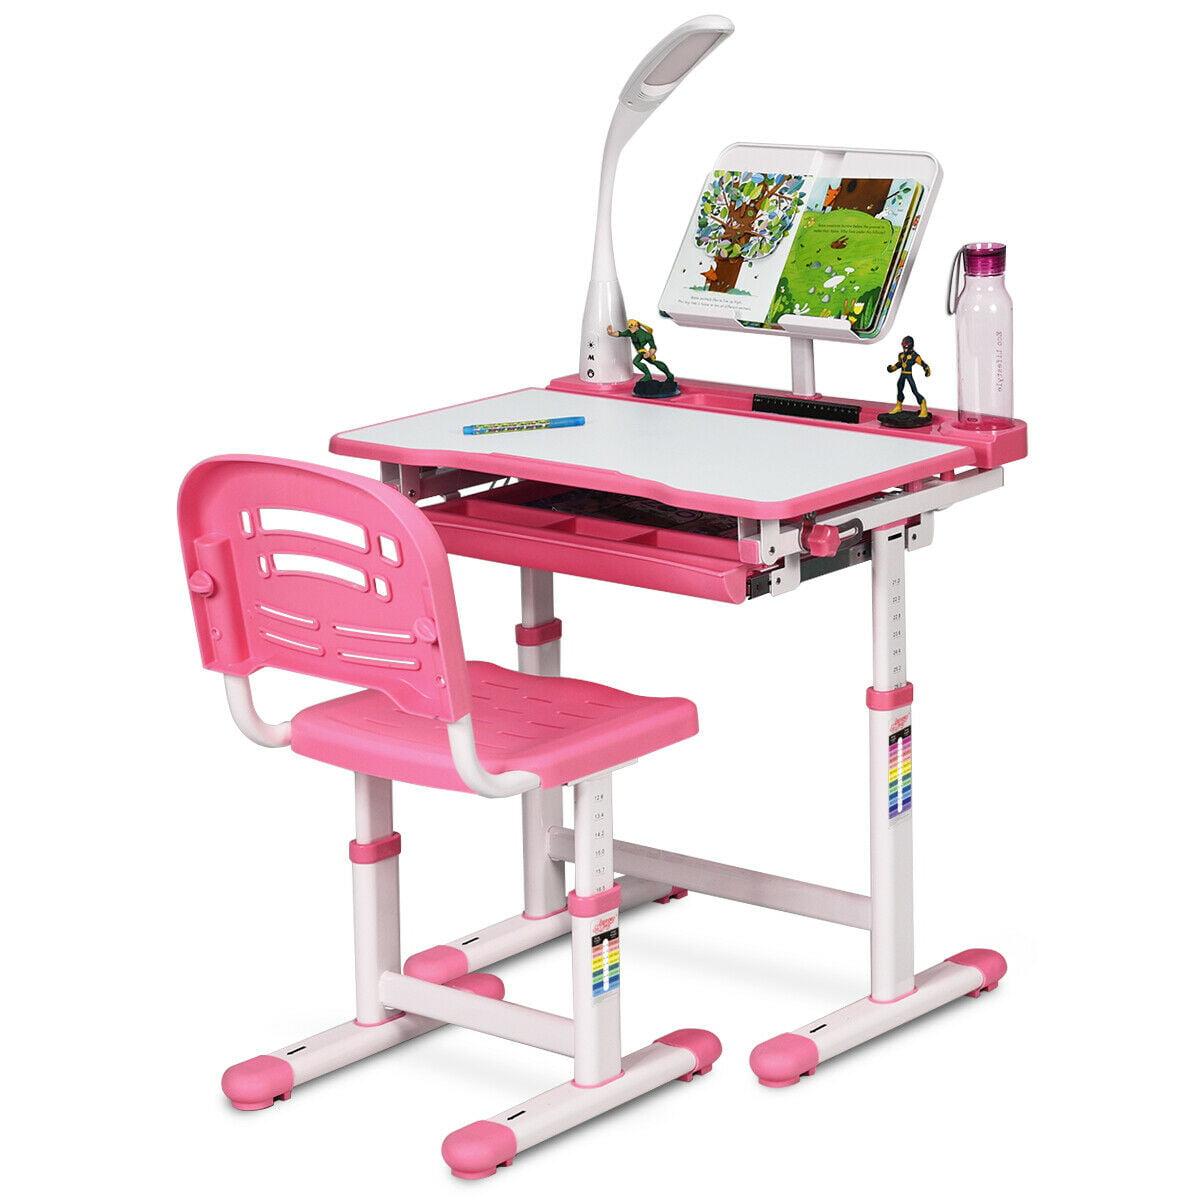 Gymax Height Adjustable Kids Desk Chair Set Study Drawing W Lamp Bookstand Pink Walmart Com Walmart Com